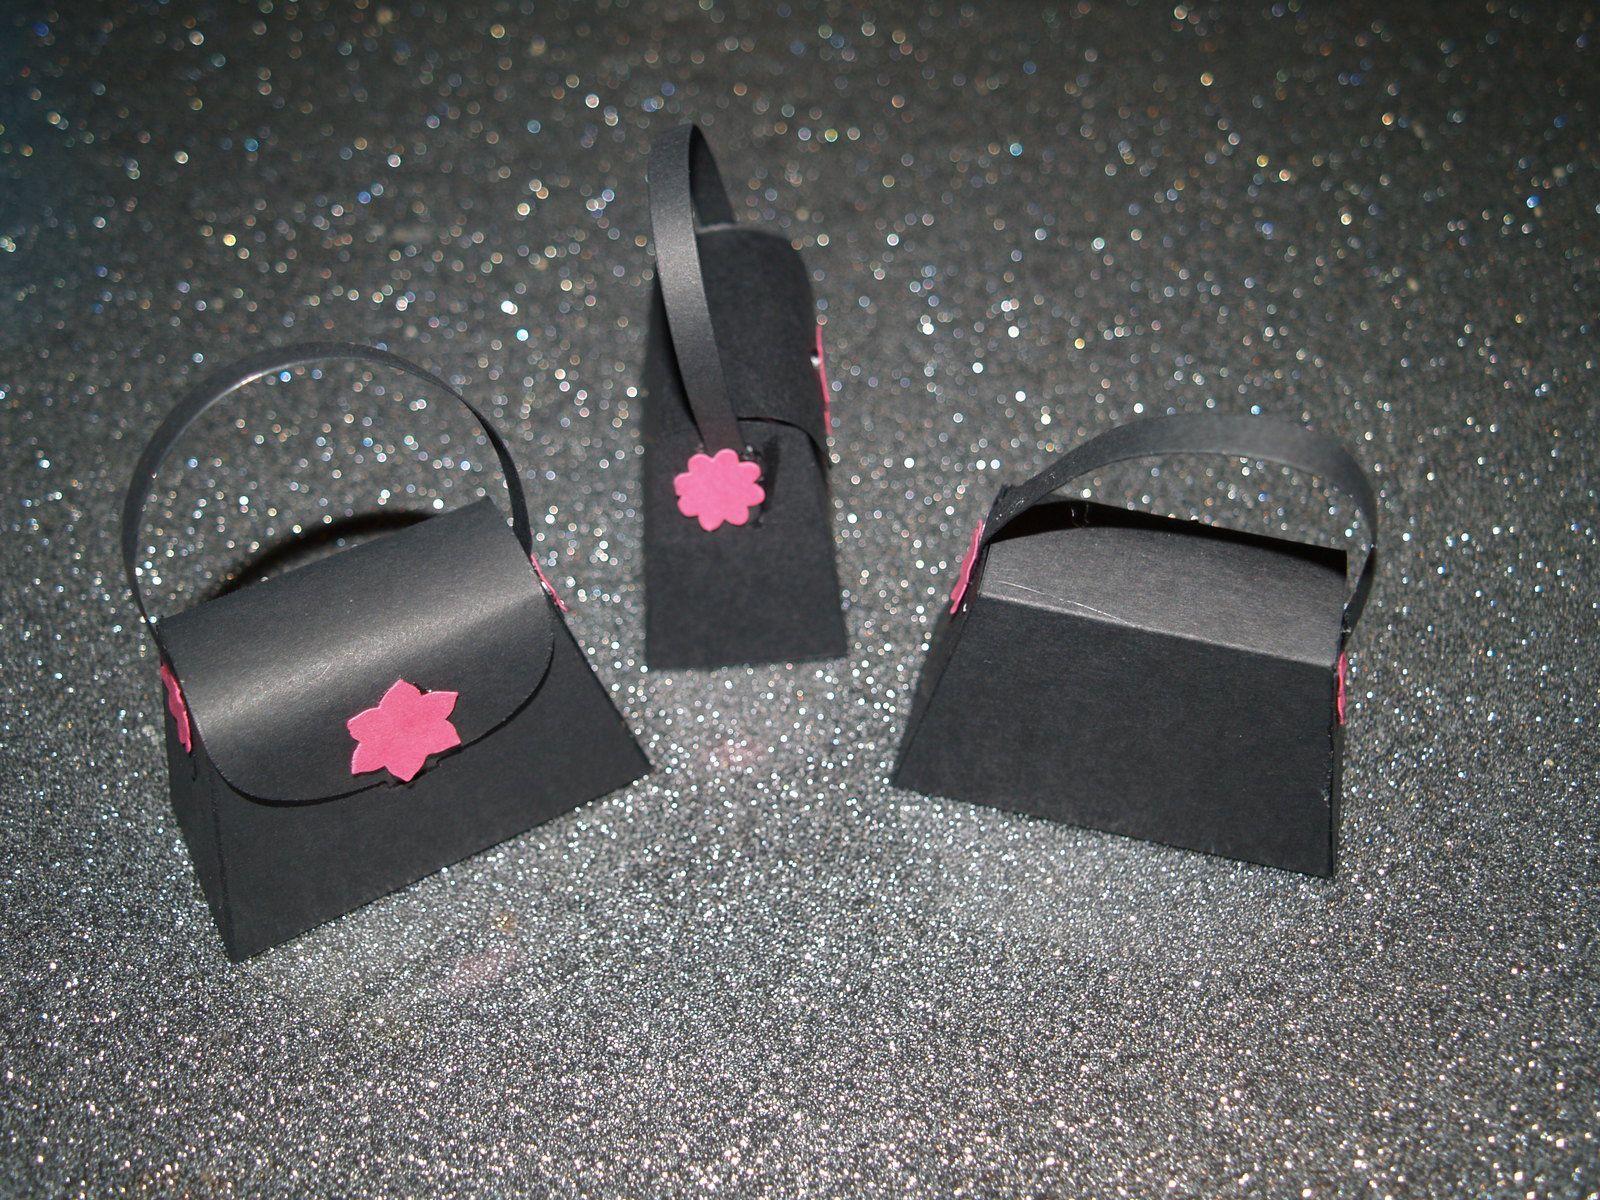 papiers noir nu, brune dune et bavarois de framboise&#x3B; insta'enveloppe&#x3B; bigz sac à main&#x3B; perforatrice Boho Blossom.